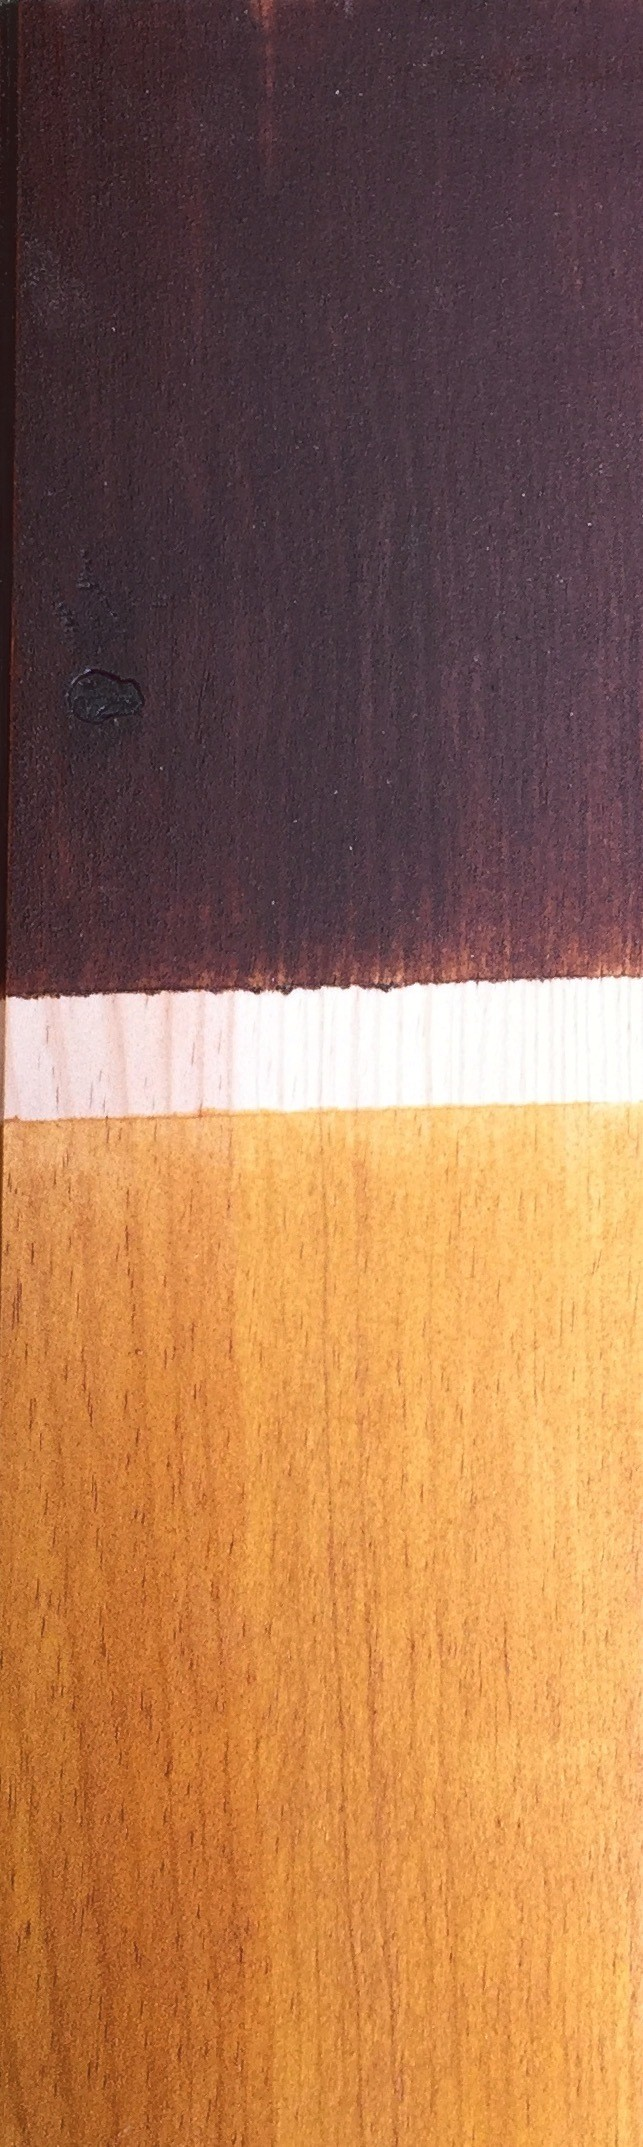 Owatrol DURIEU antigliss couleur - Voir en grand